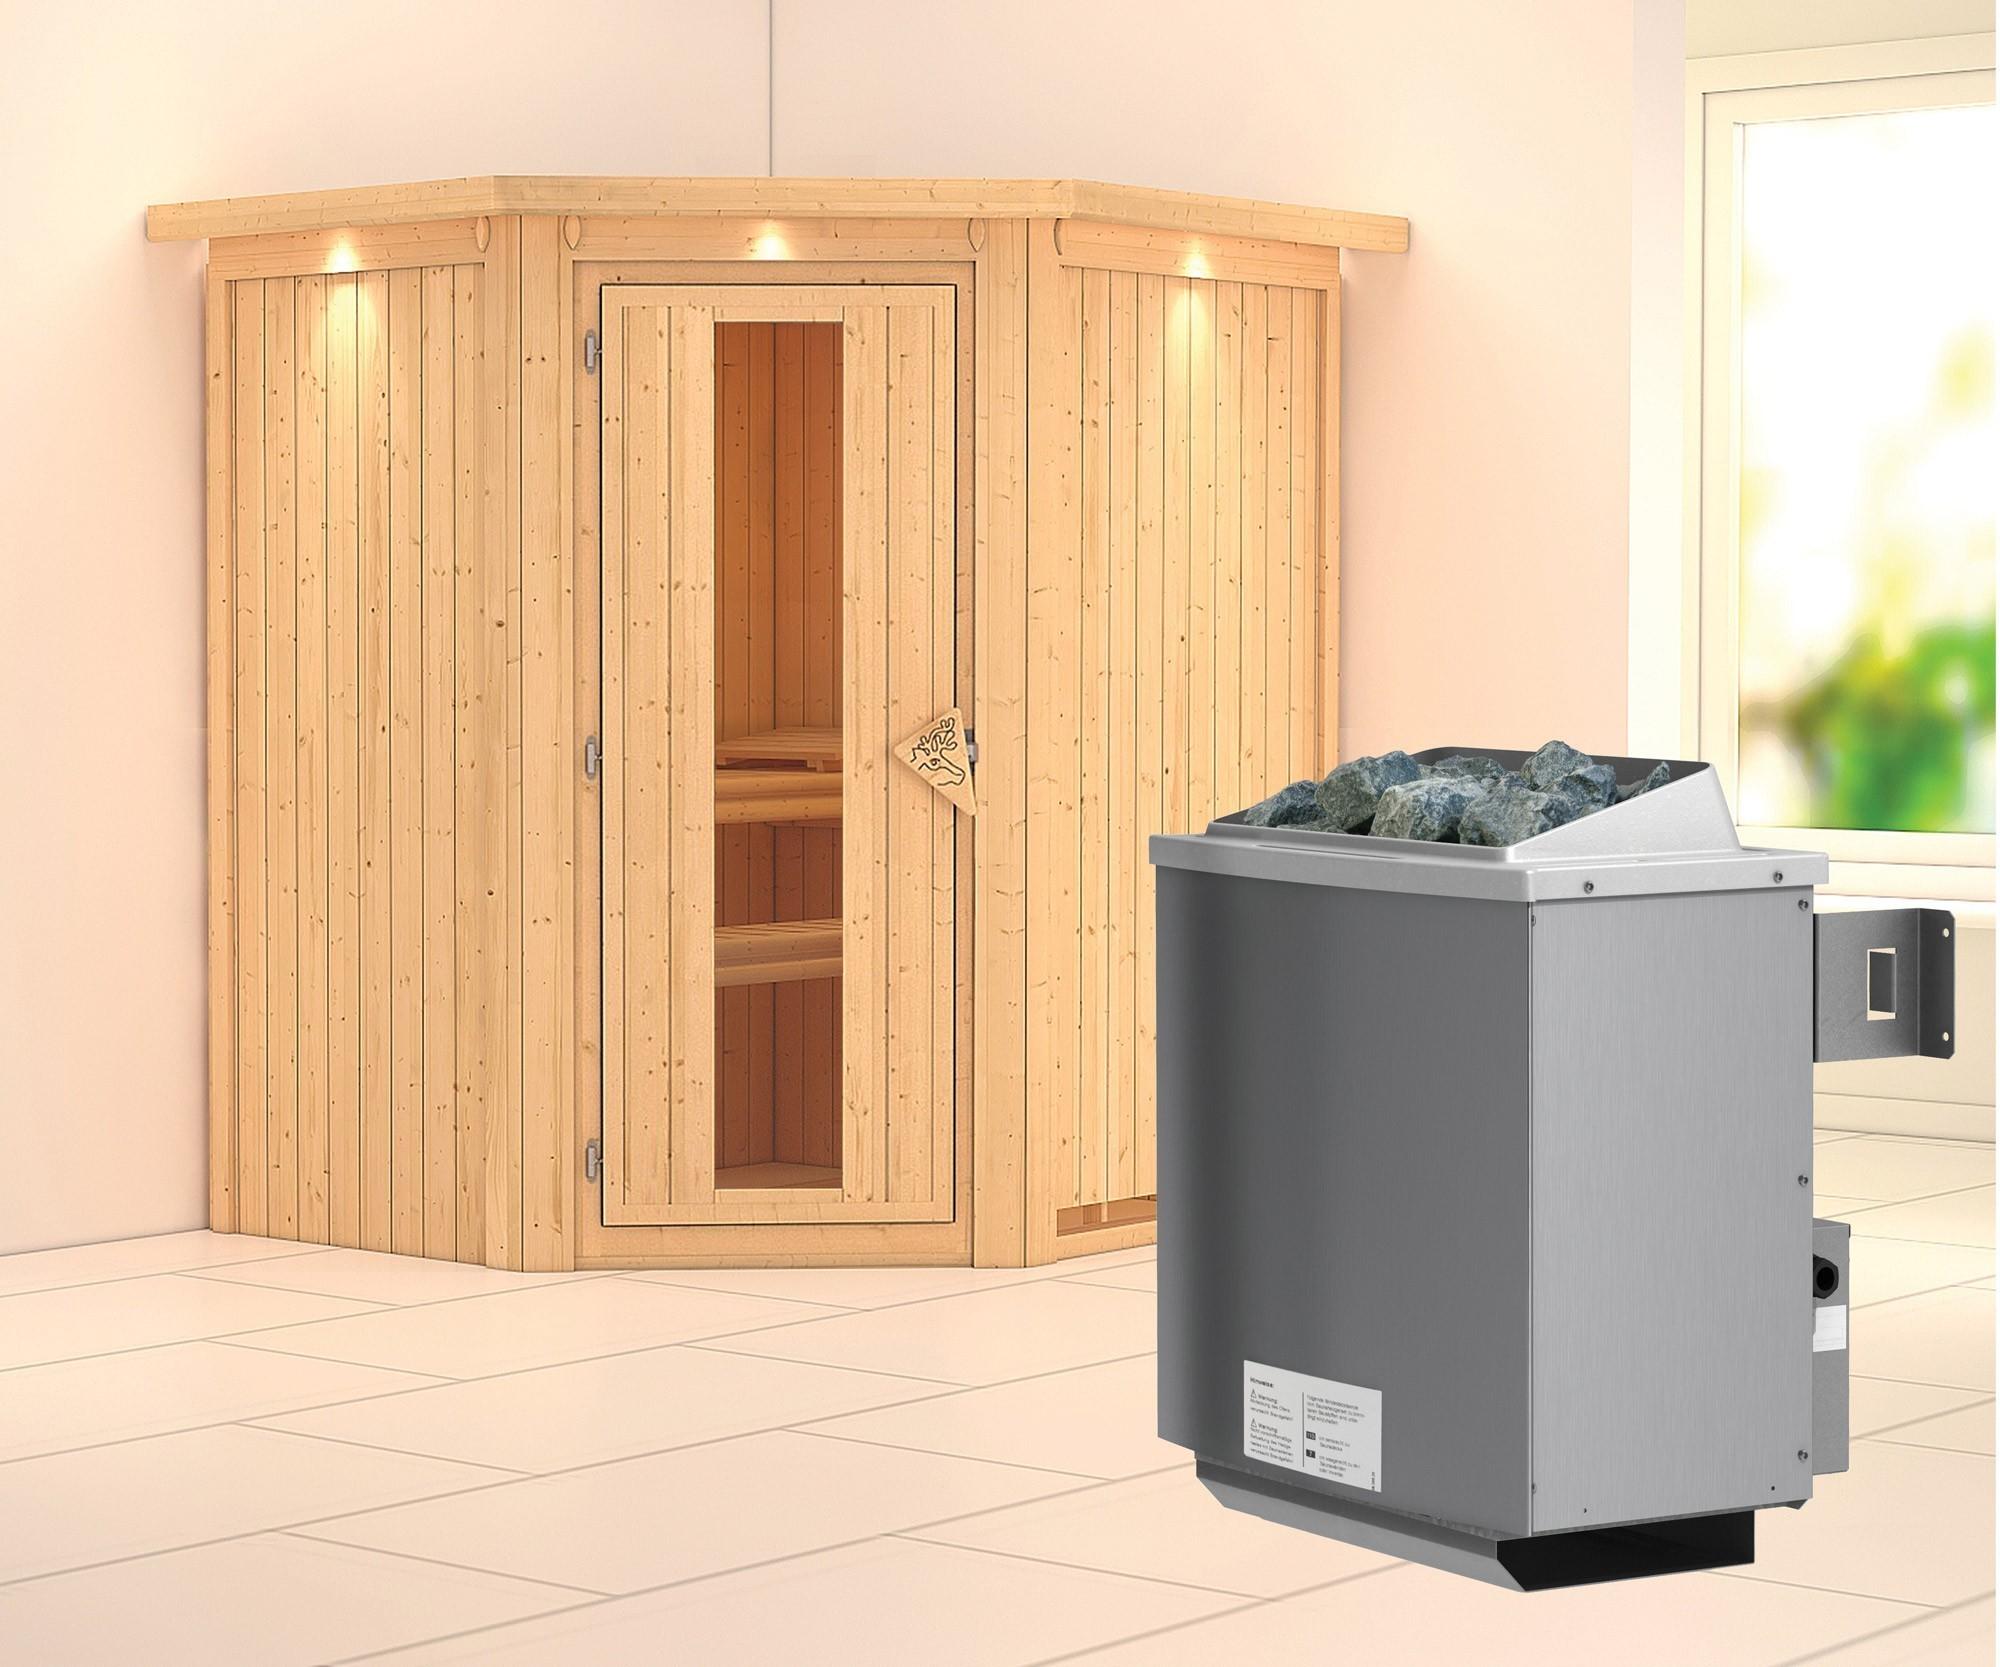 Karibu Sauna Taurin 68mm Dachkranz Saunaofen 9kW intern Holztür Bild 1